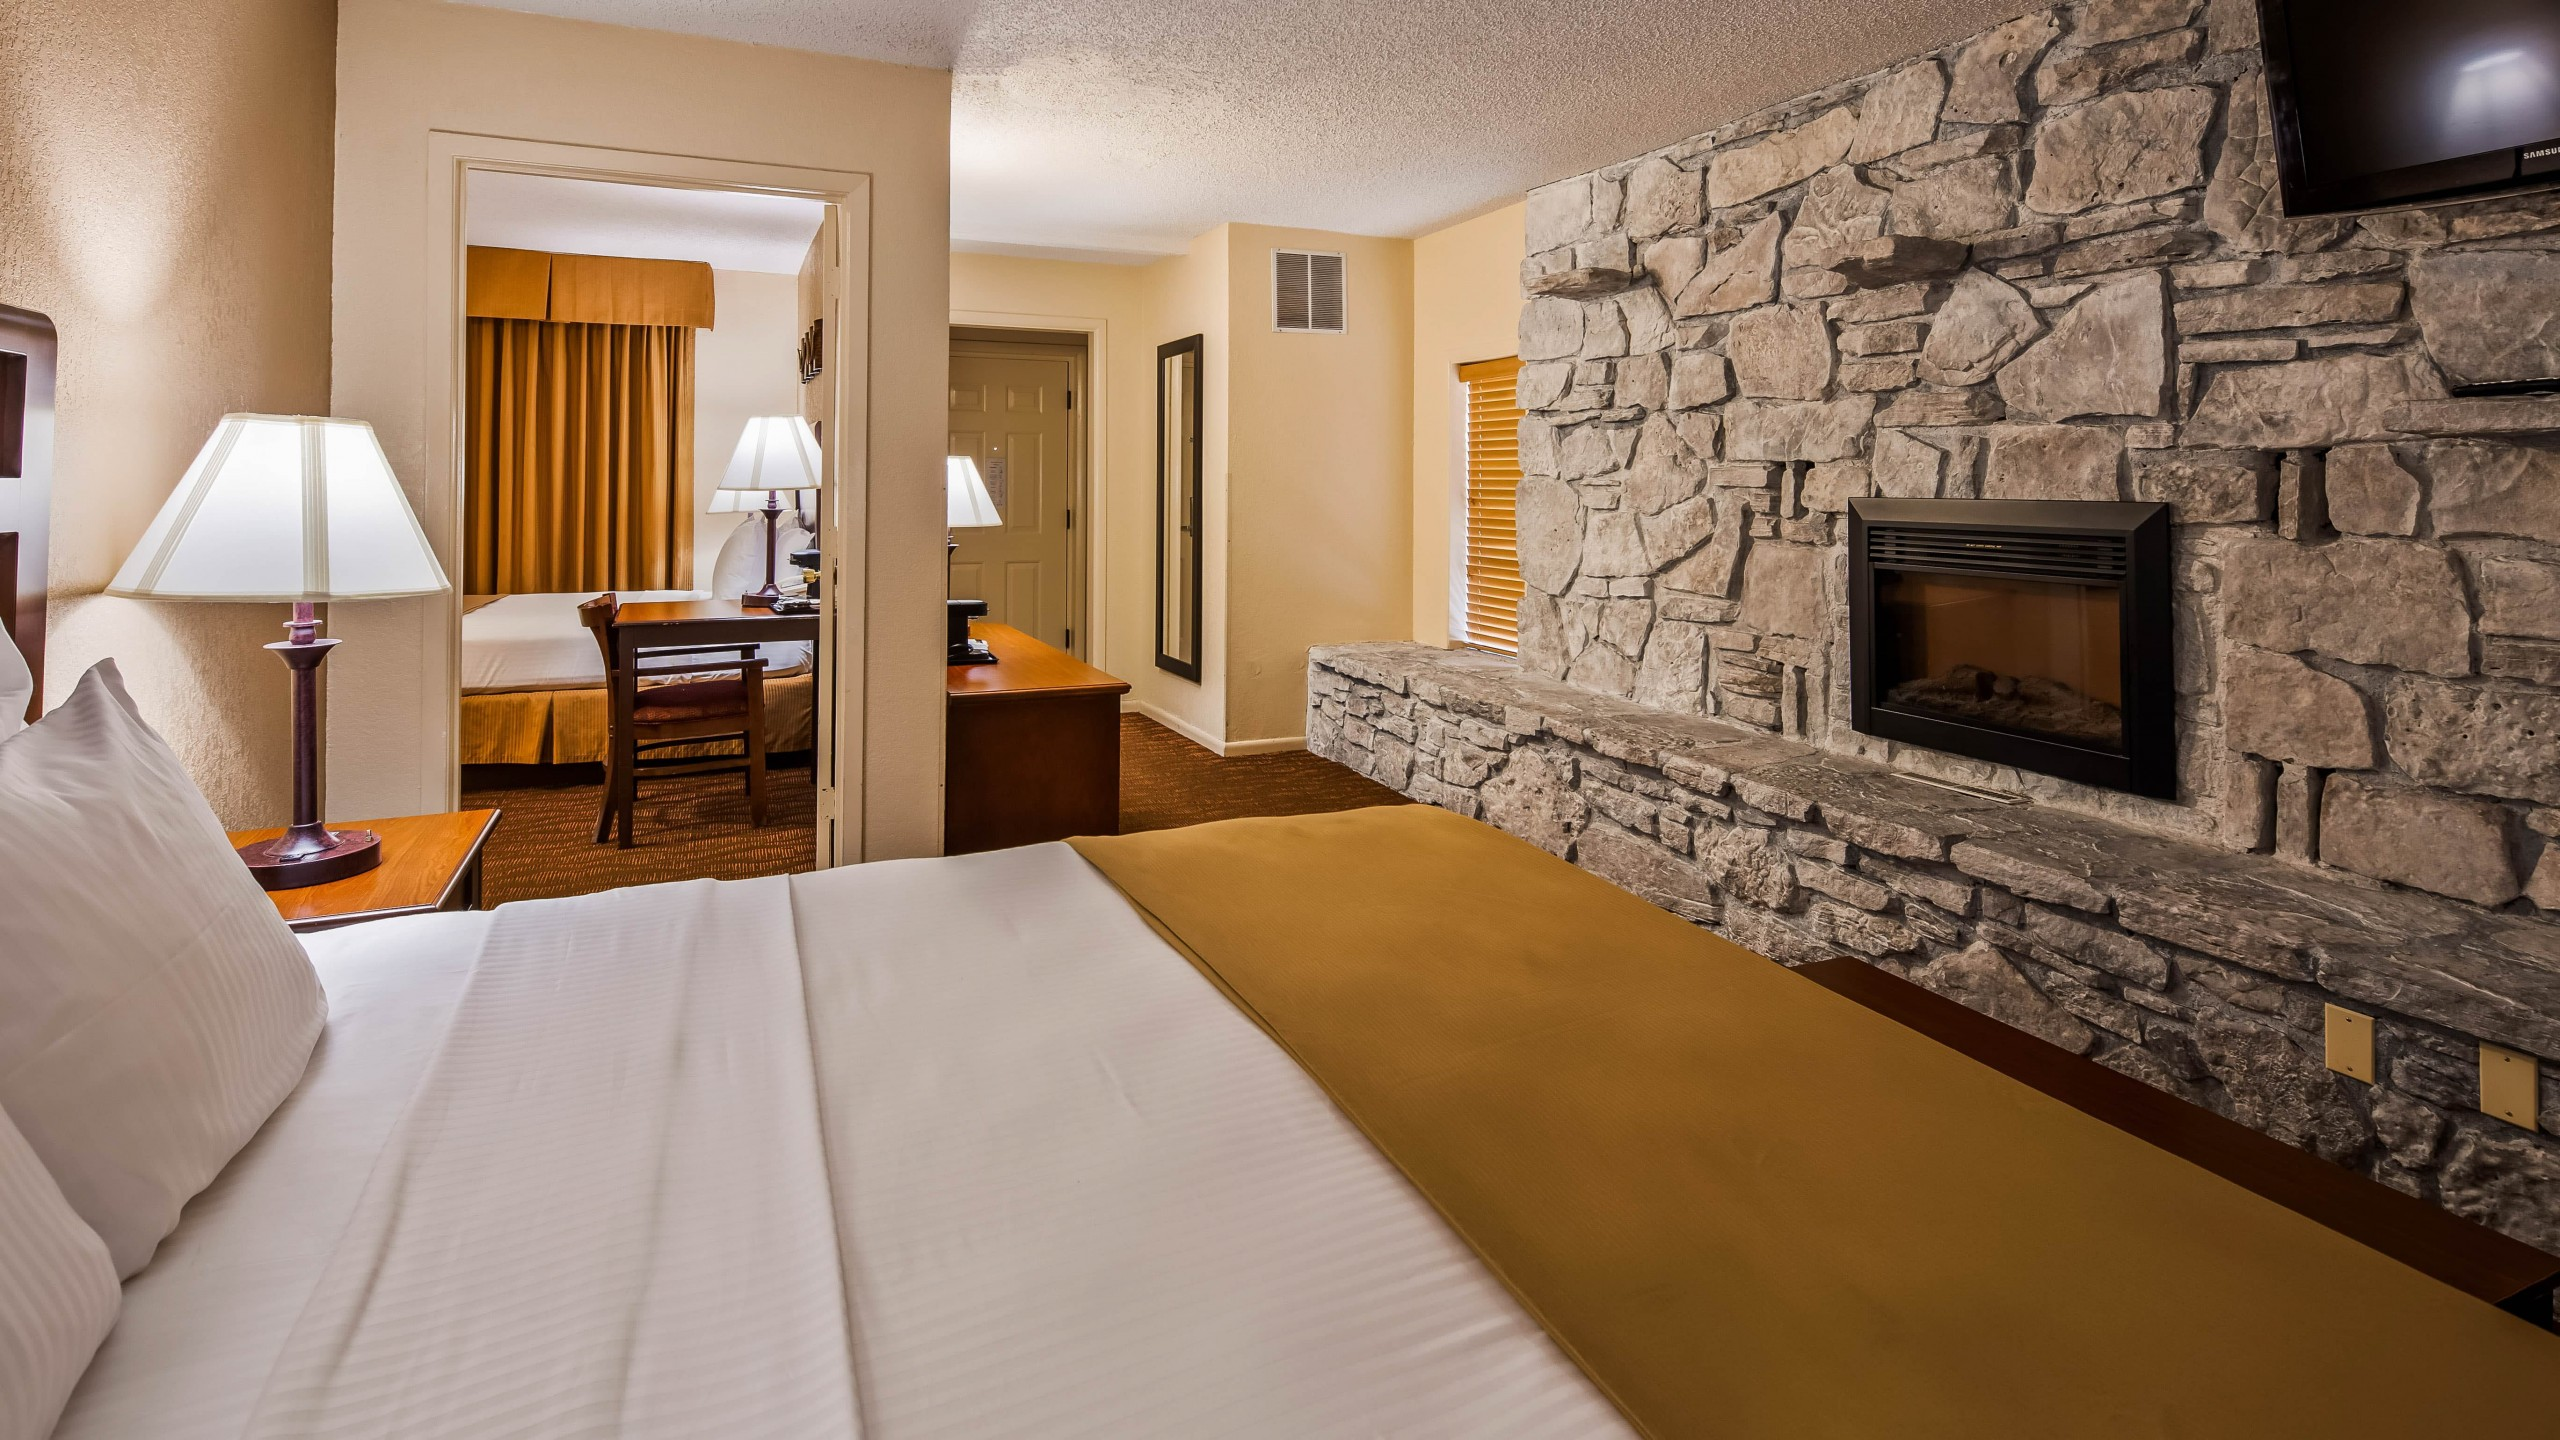 Best Western Center Pointe Inn Family Suite